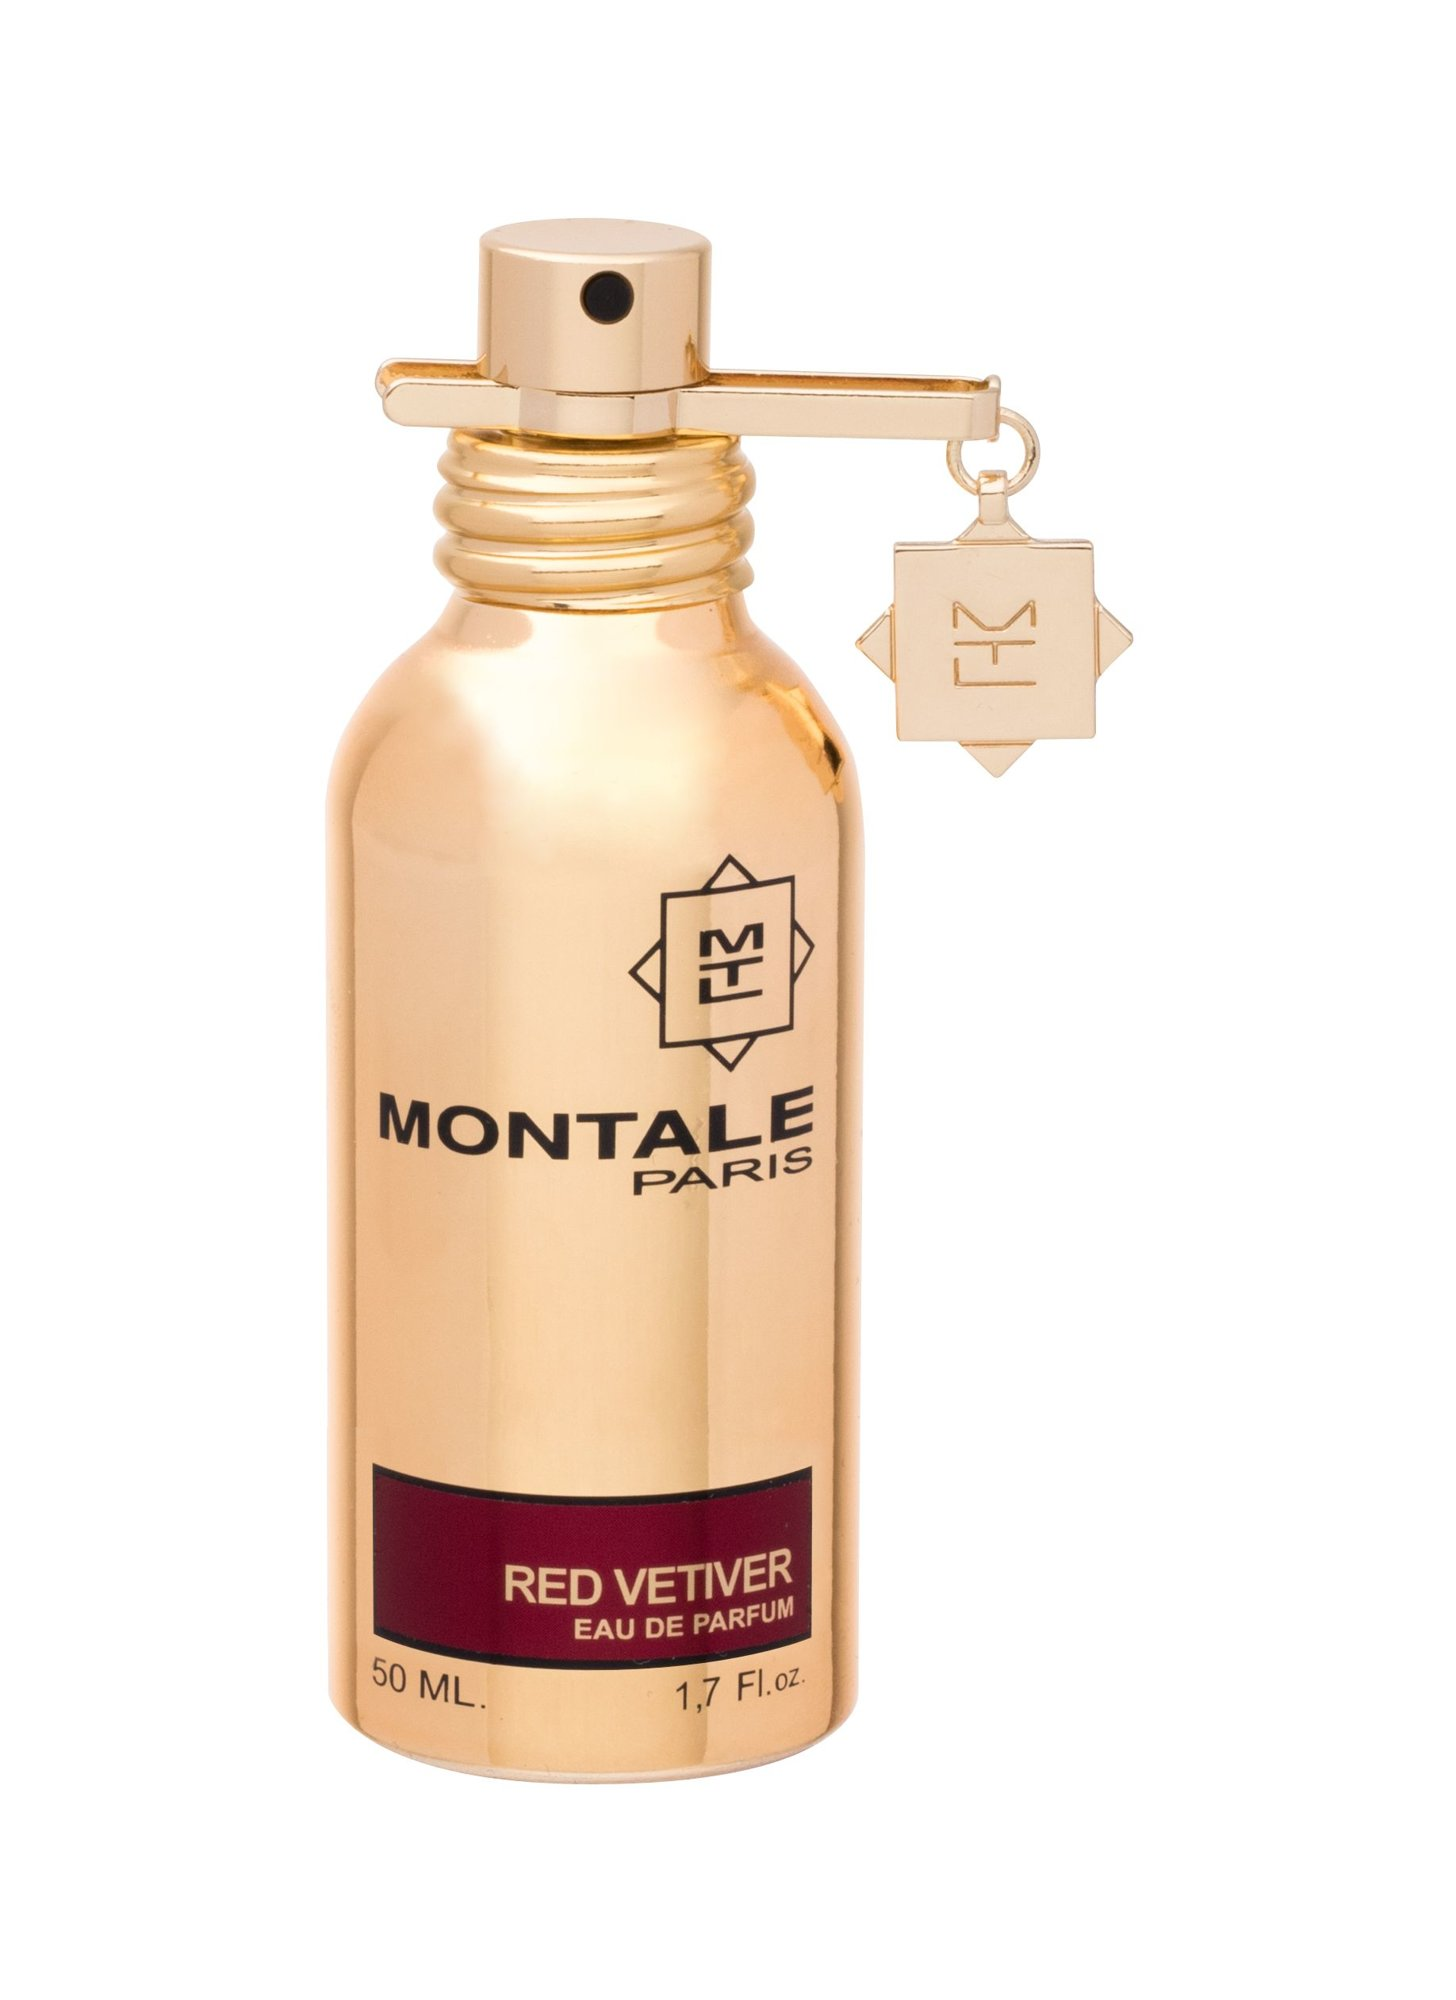 Montale Paris Red Vetyver EDP 50ml